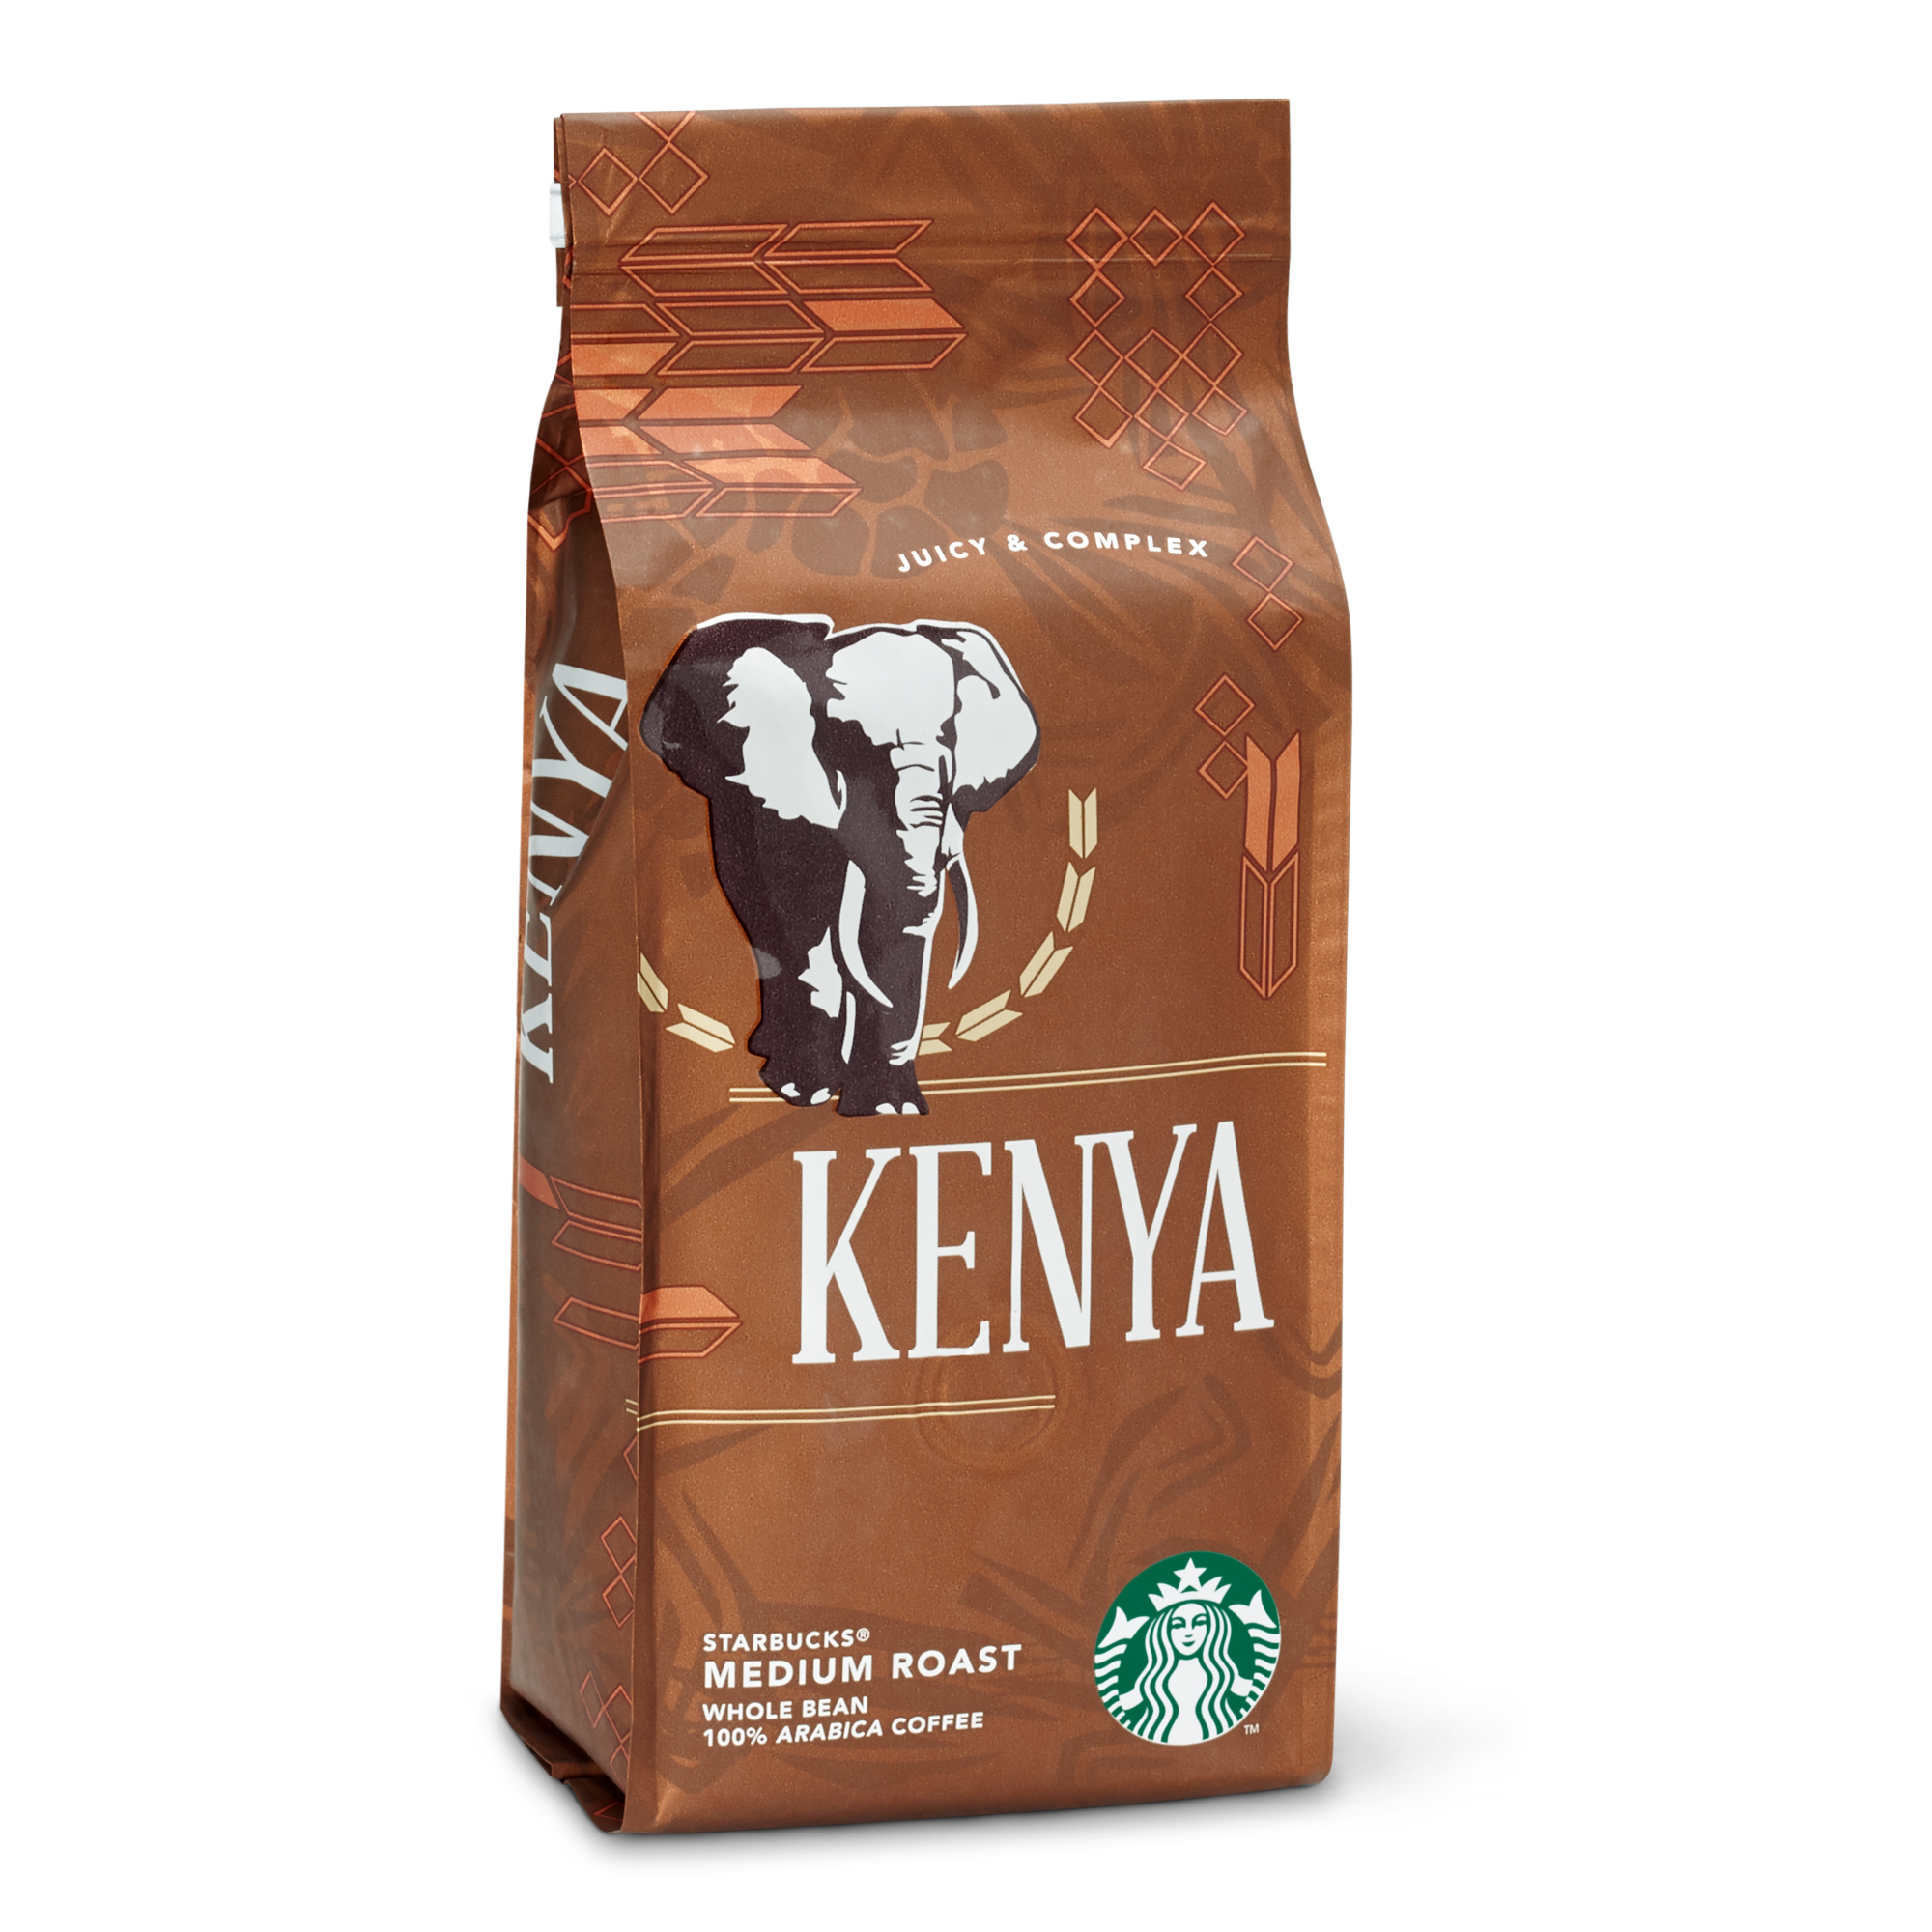 Starbucks Kenya Medium Roast Çekirdek Kahve 250 G